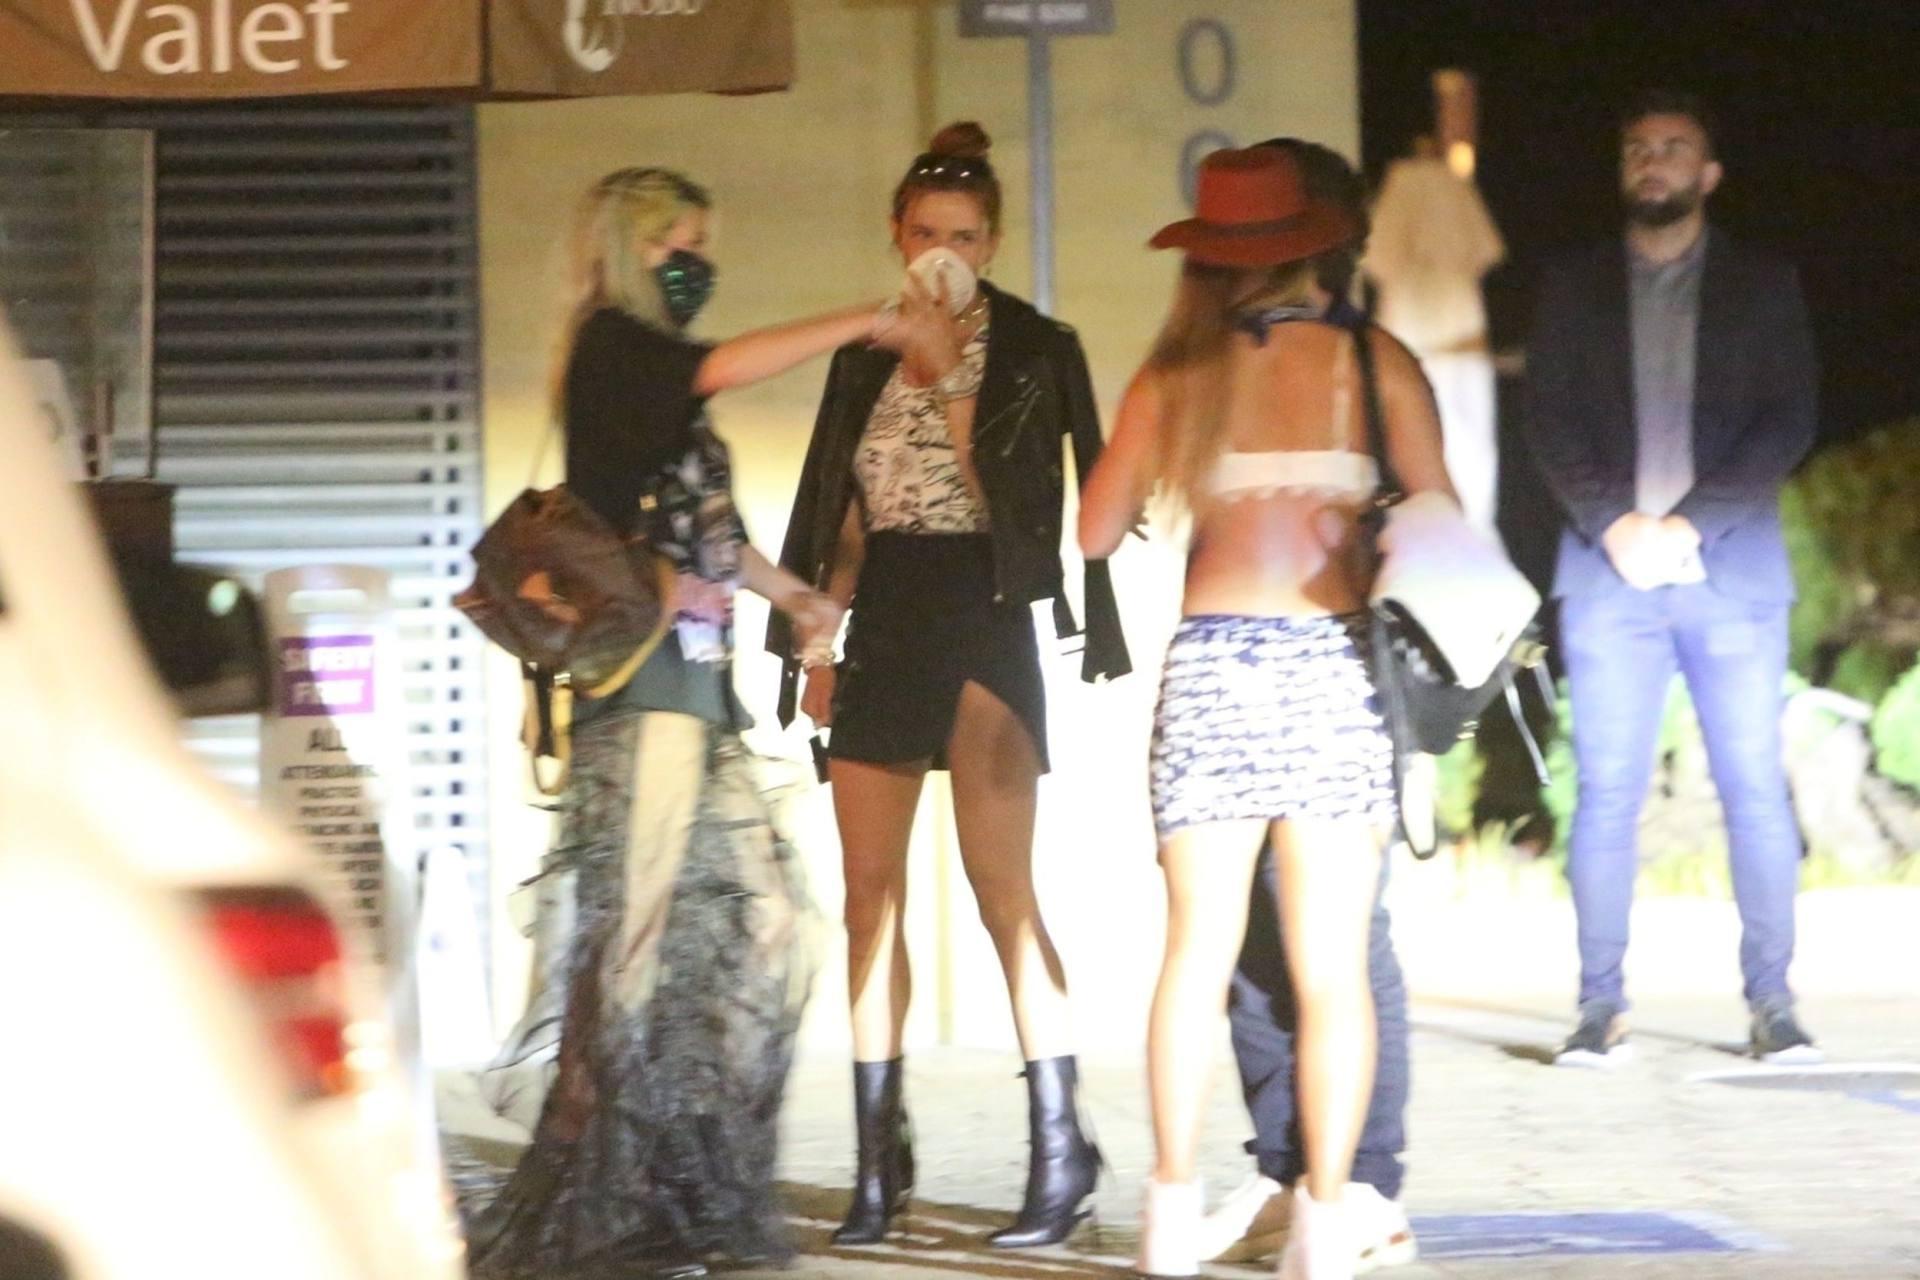 Bella & Dani Thorne – Sexy Legs In Mini Skirts At Nobu In Malibu 0020